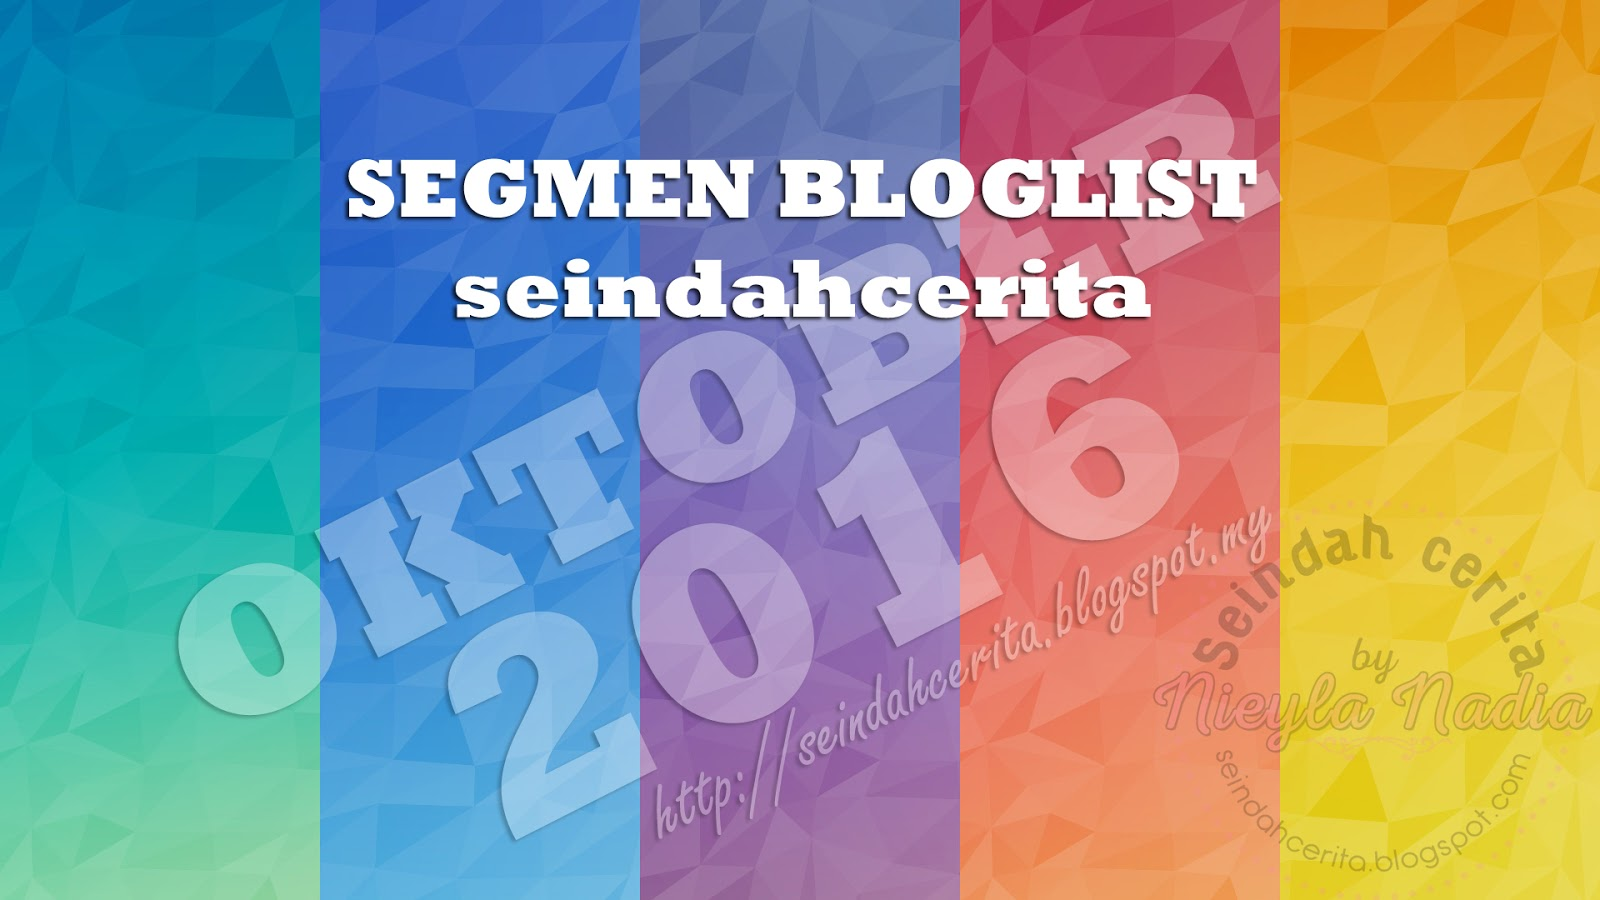 Segmen Bloglist Oktober Blog Seindahcerita